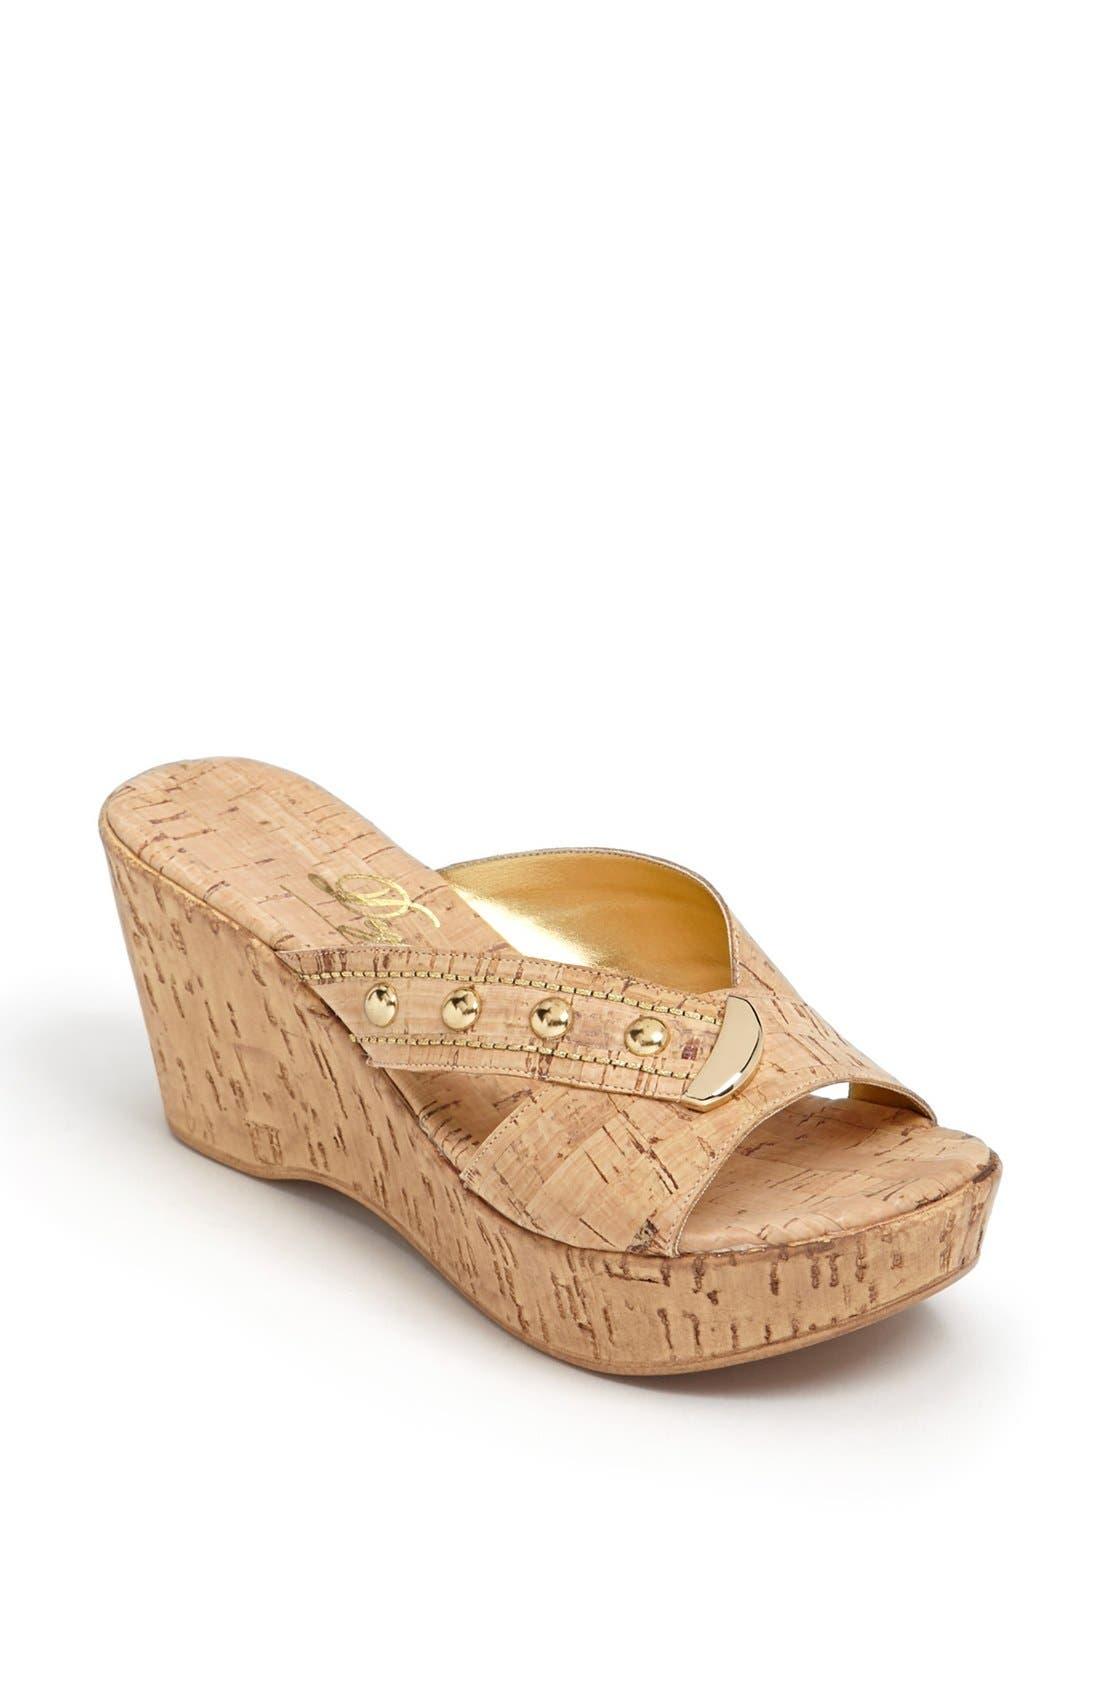 Main Image - Dezario 'Delta' Sandal